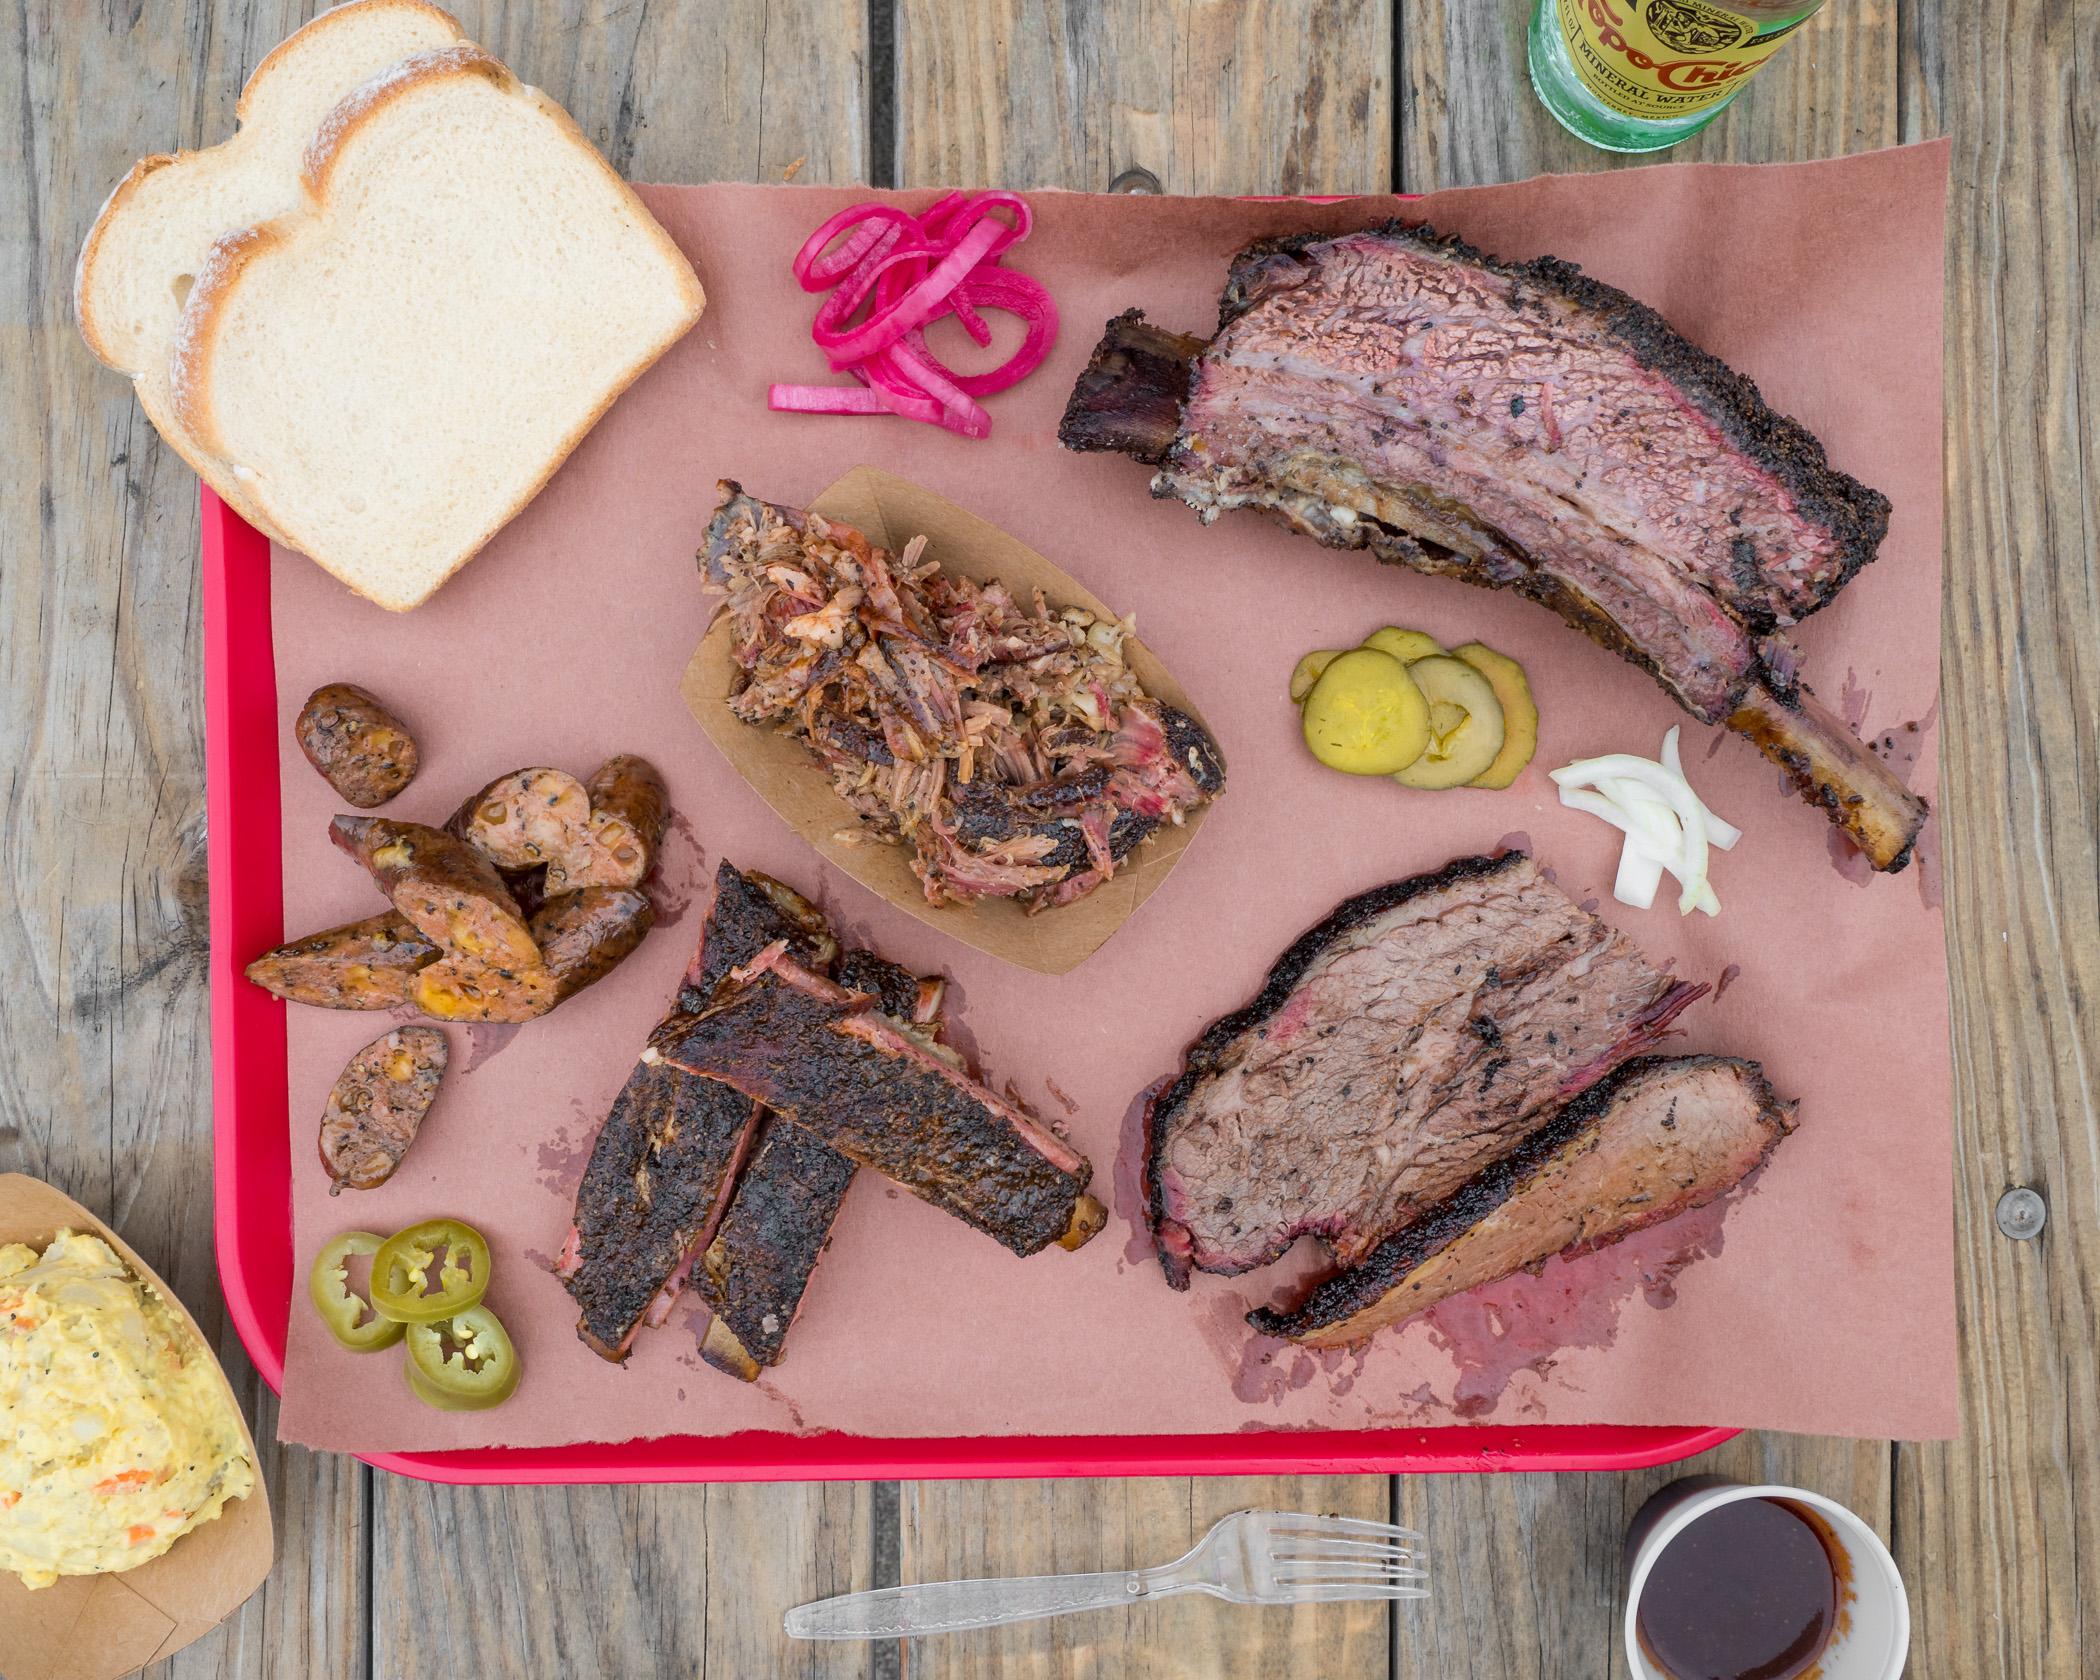 Jeremy Pawlowski Portland Texas Austin Amarillo Food Photographer Photography Fare Photo Studios bbq barbecue barbeque plate